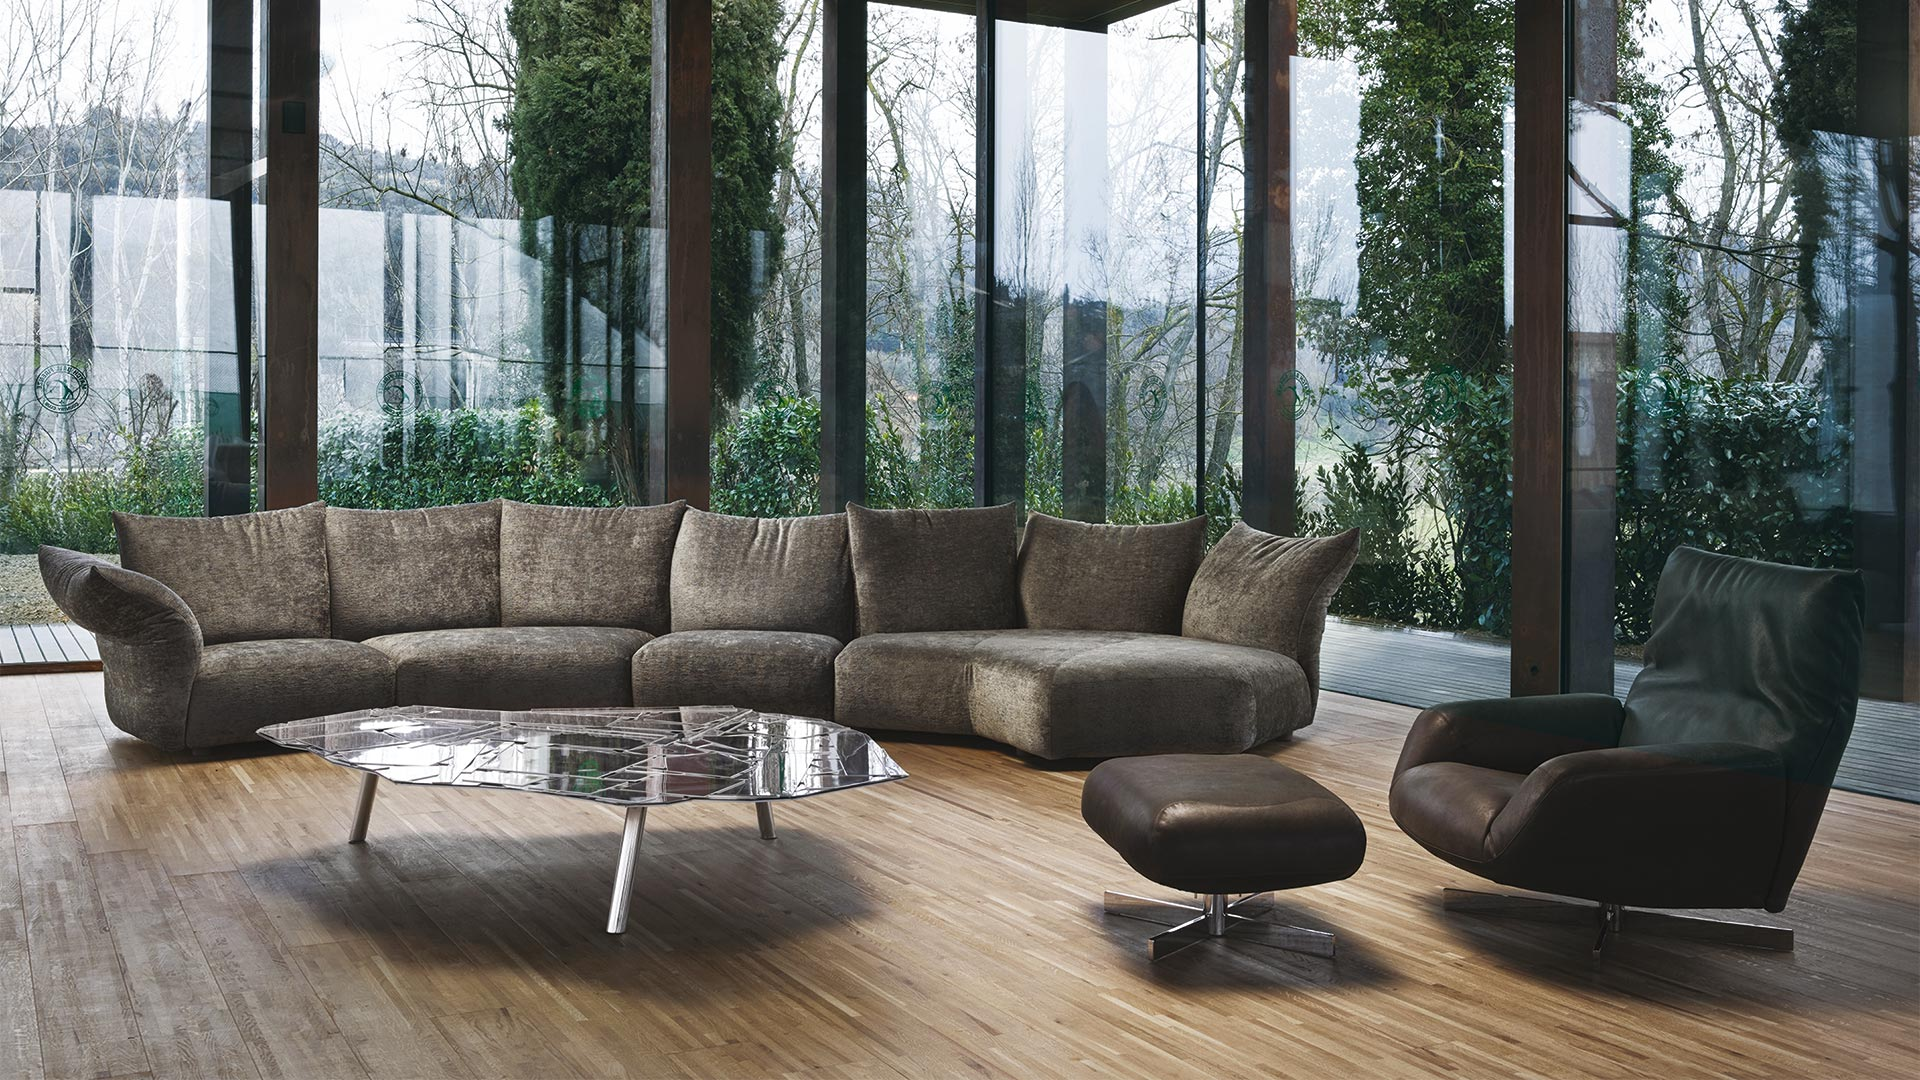 Edra Standard Sofa in Berlin bei steidten++